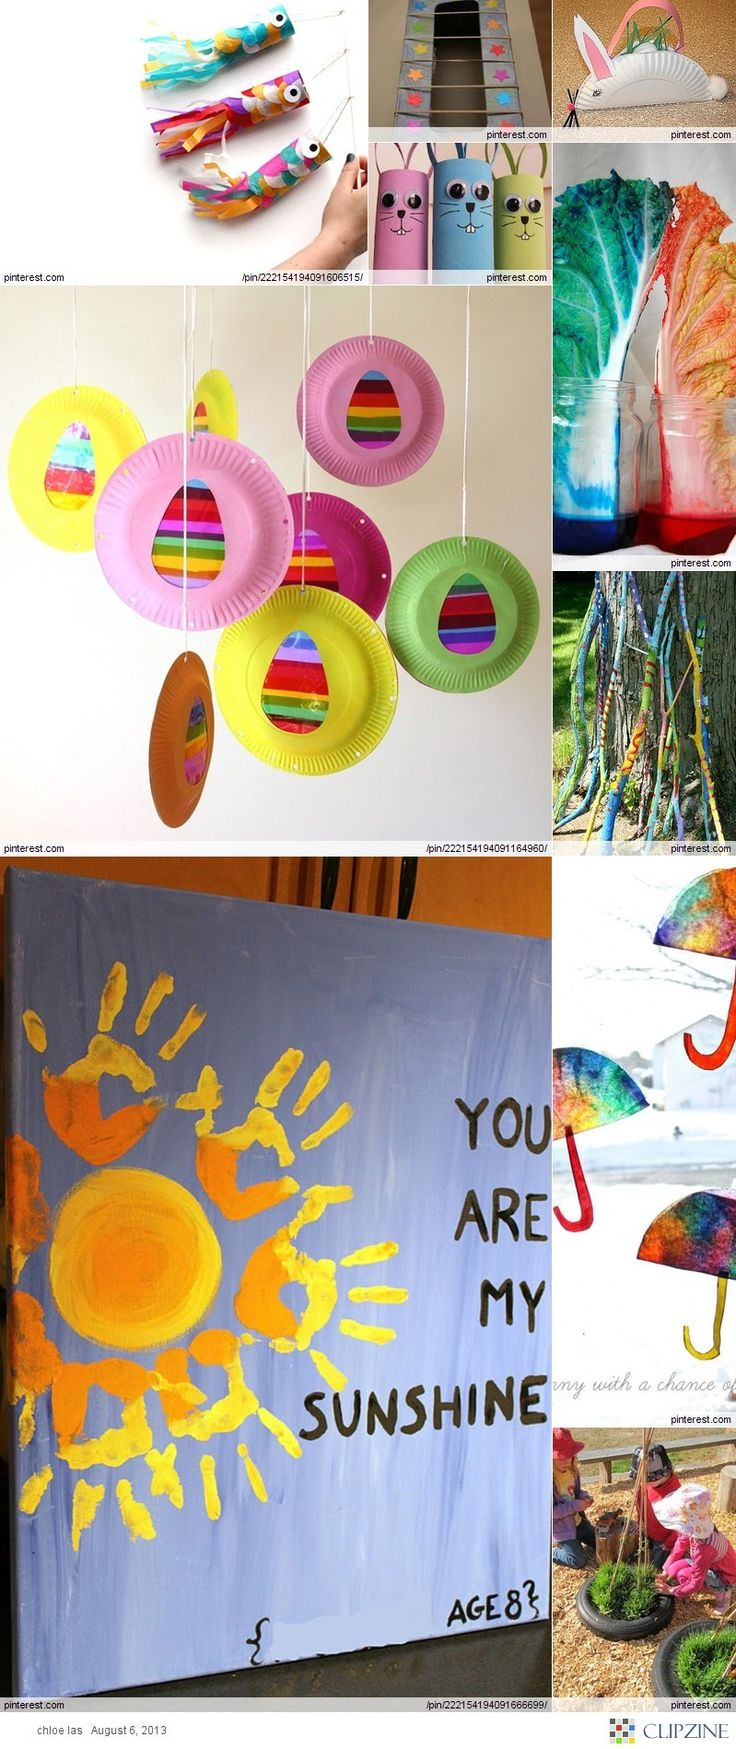 Multiple Kids Crafts Ideas: Handprint/Sunshine, Easter Crafts, Sticks & Yarn/Thread, TP Roll Crafts, & More...